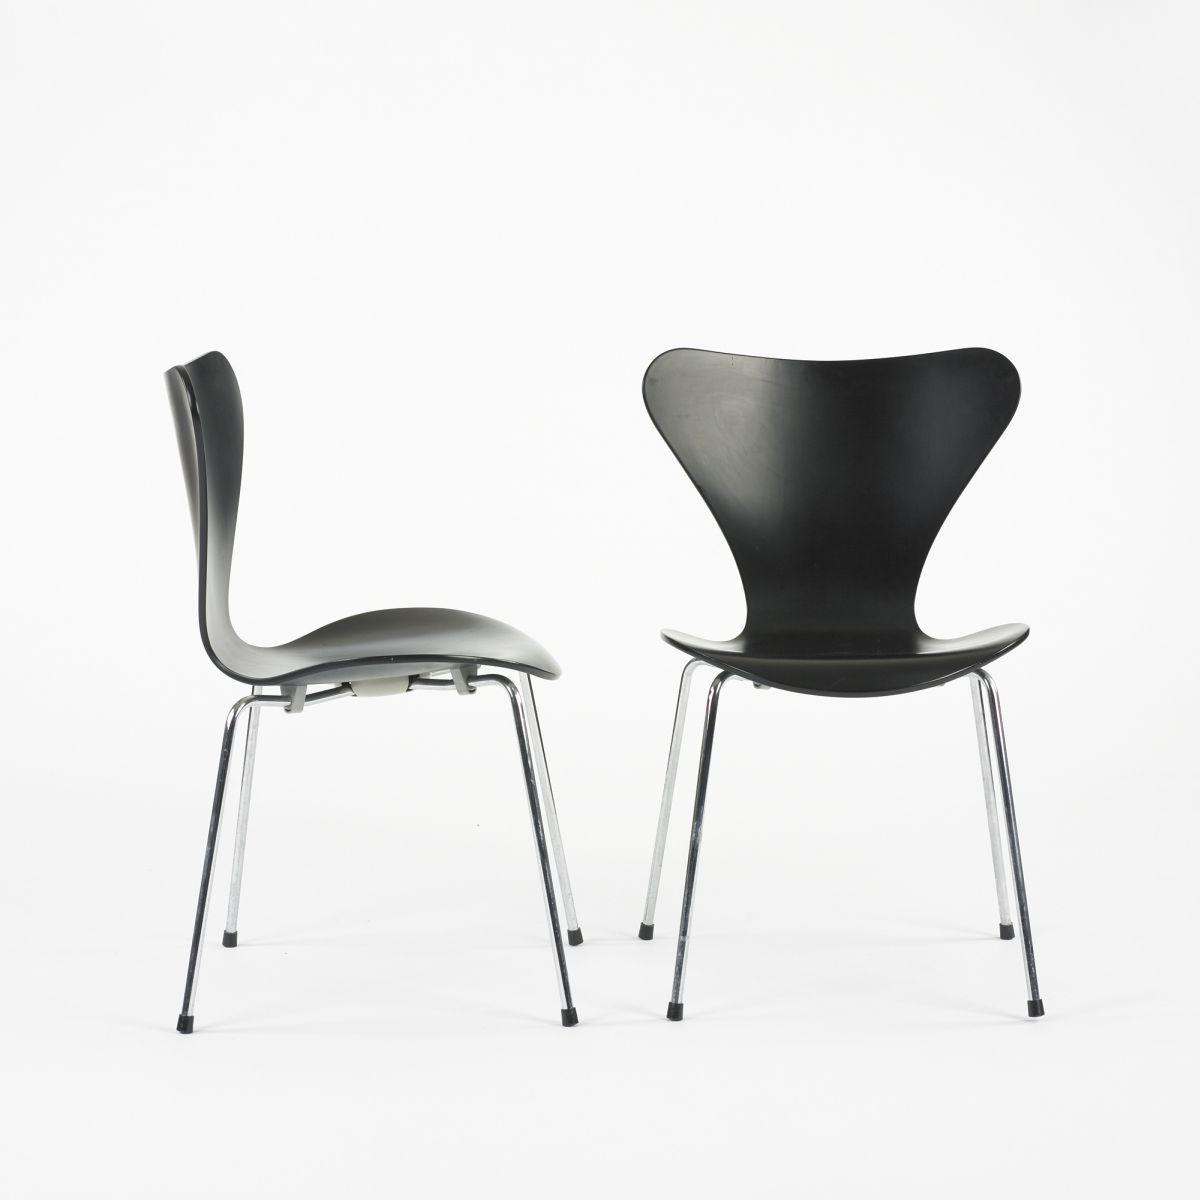 Arne Jacobsen Sevener chairs model 3107, pair